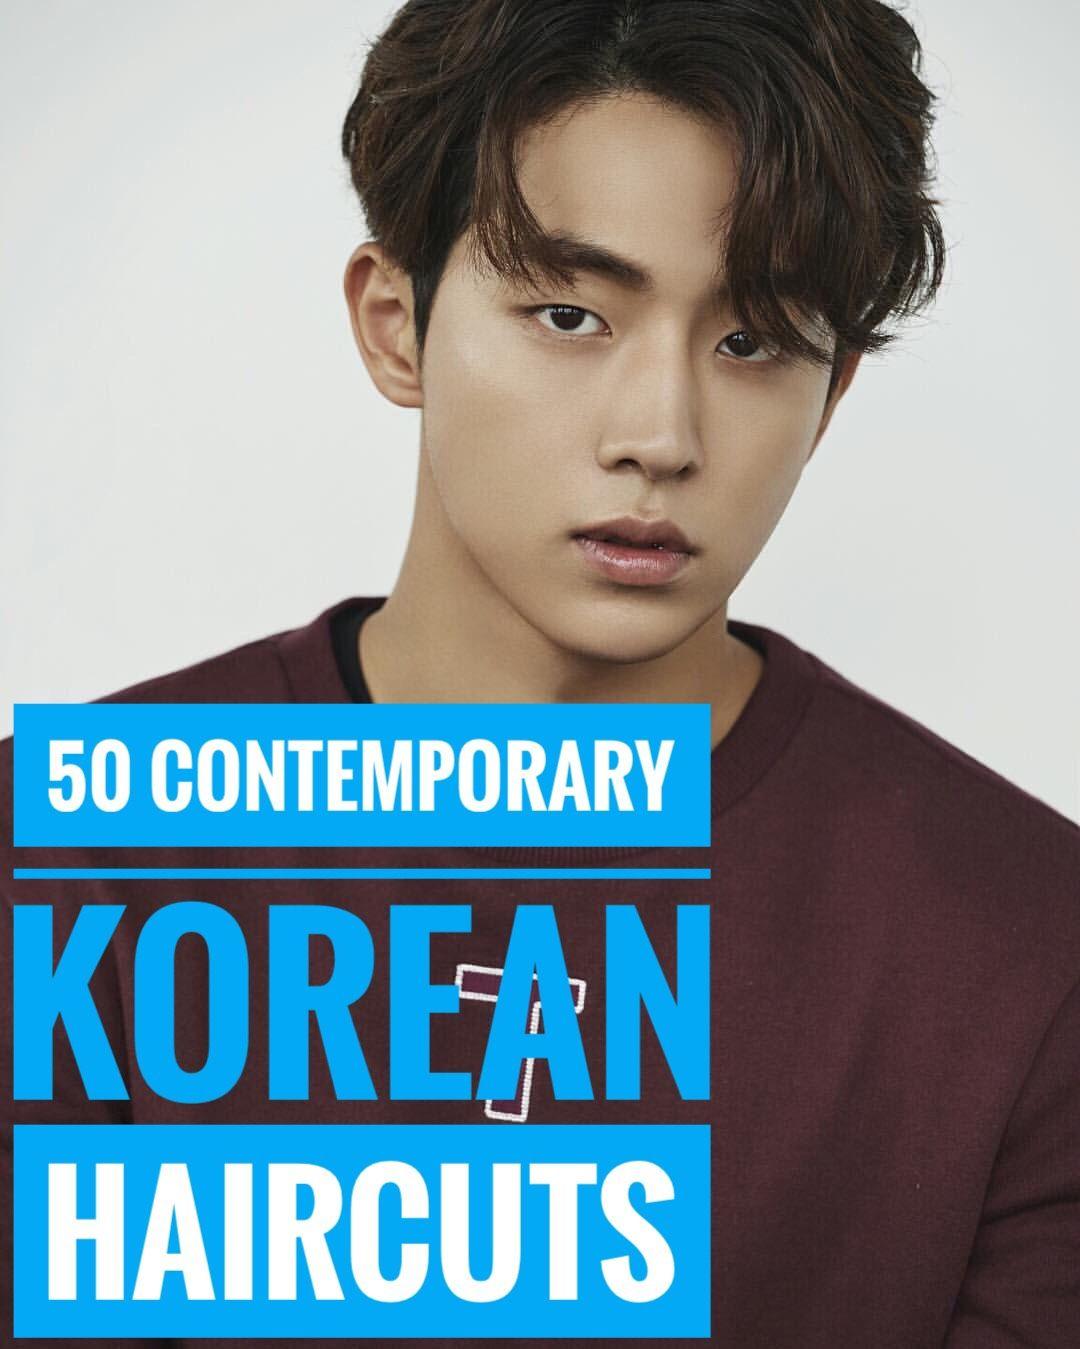 Pin on Korean hairstyle (boy)